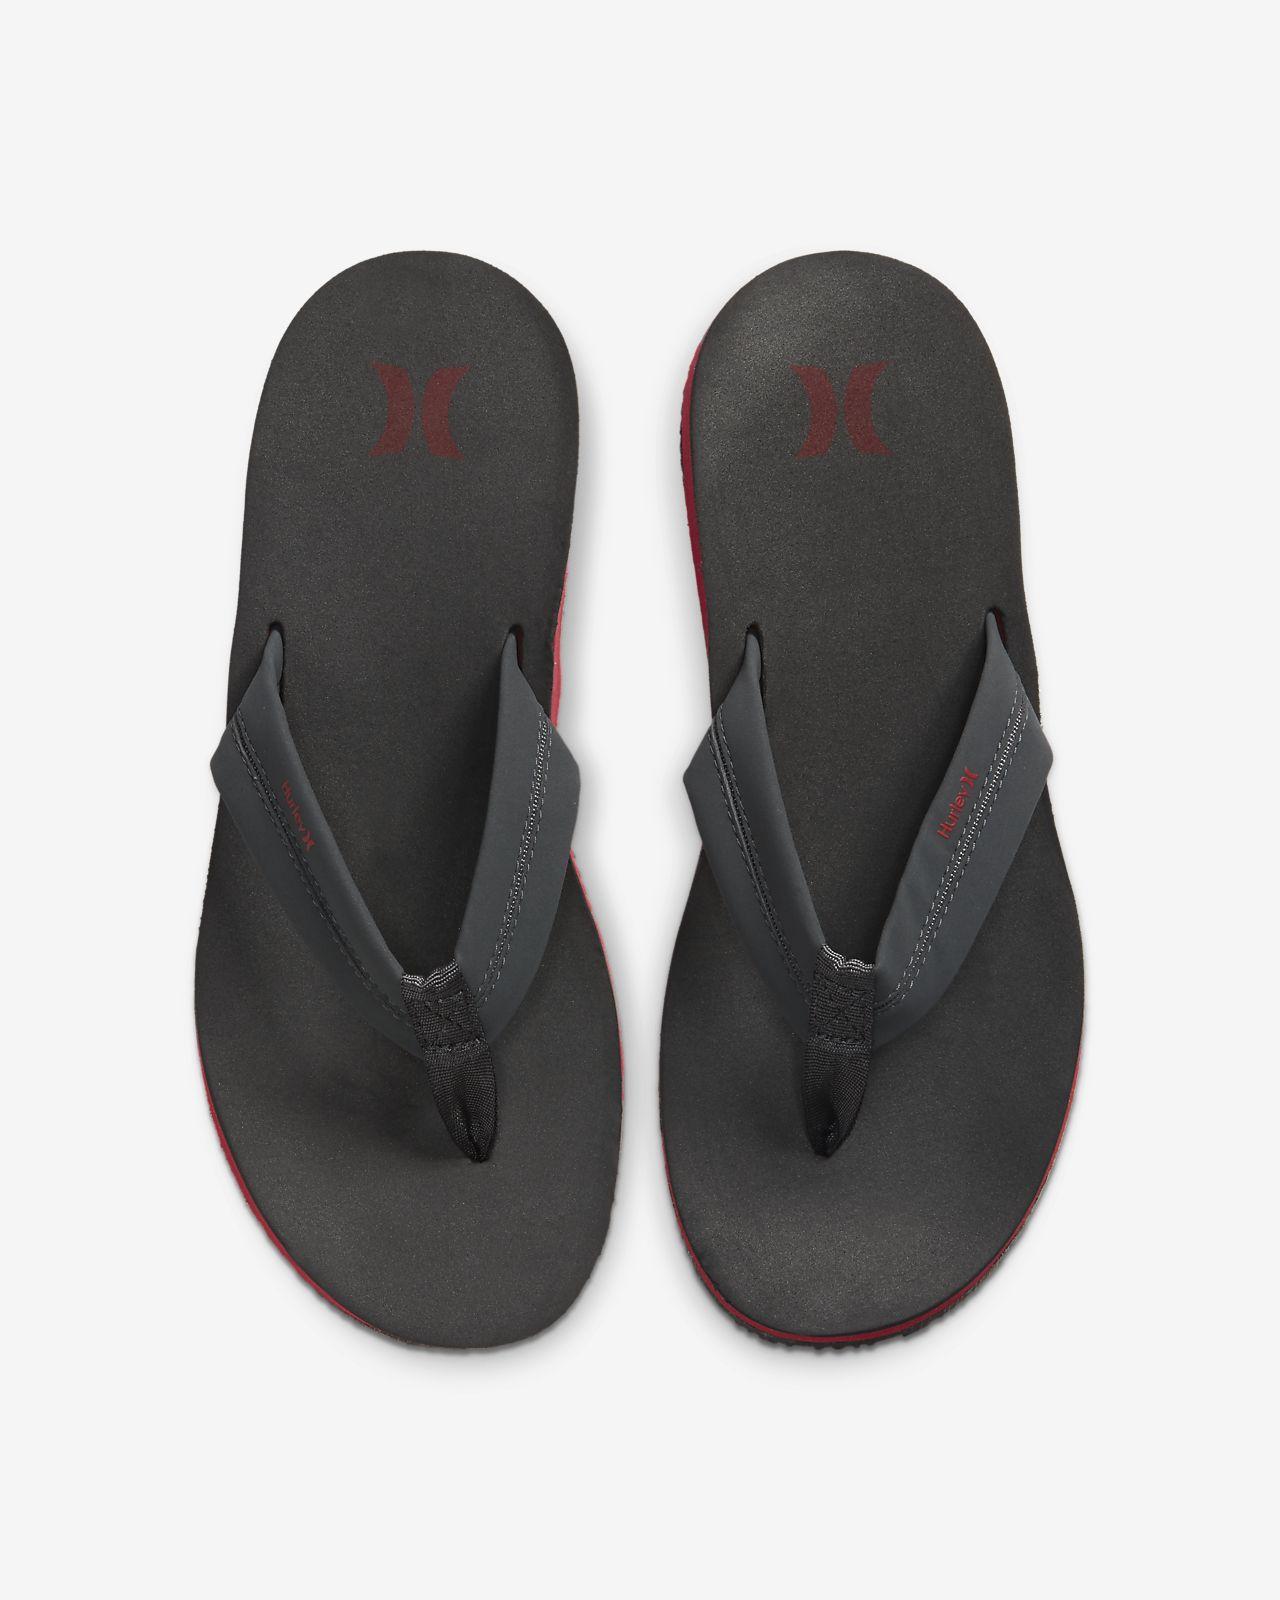 Hurley Lunar Men's Sandals